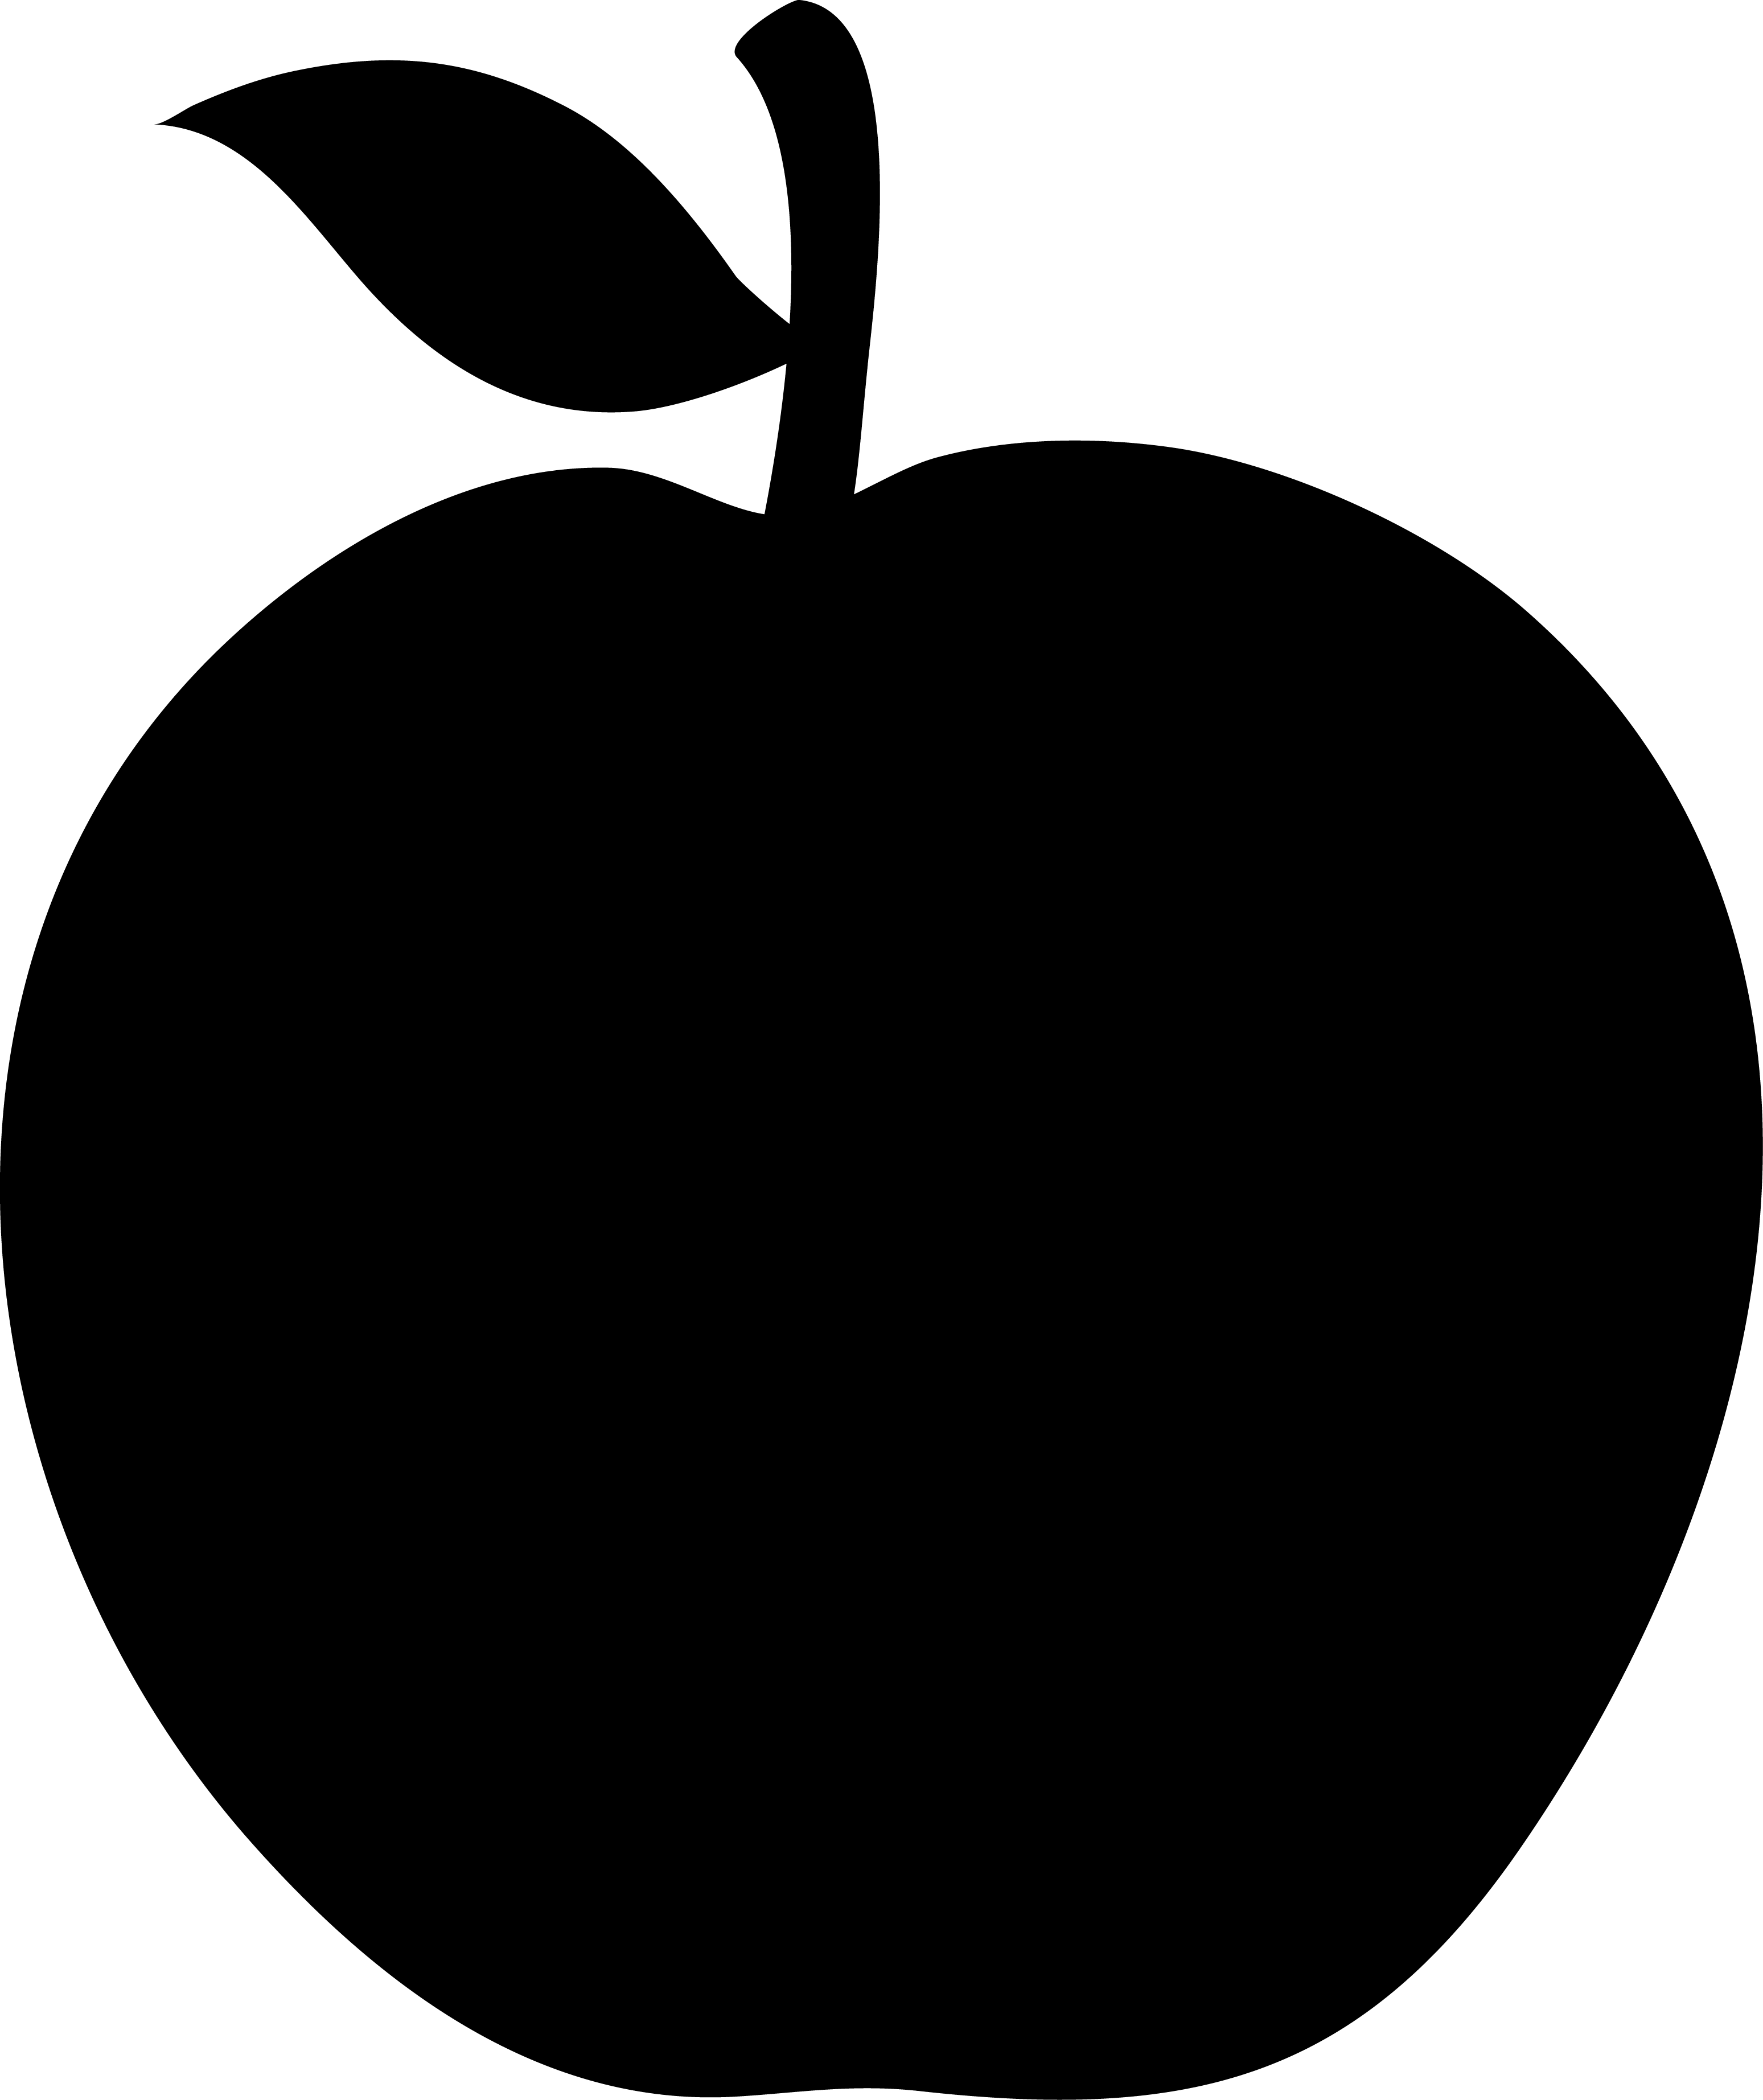 3097x3689 Apple Clipart Silhouette